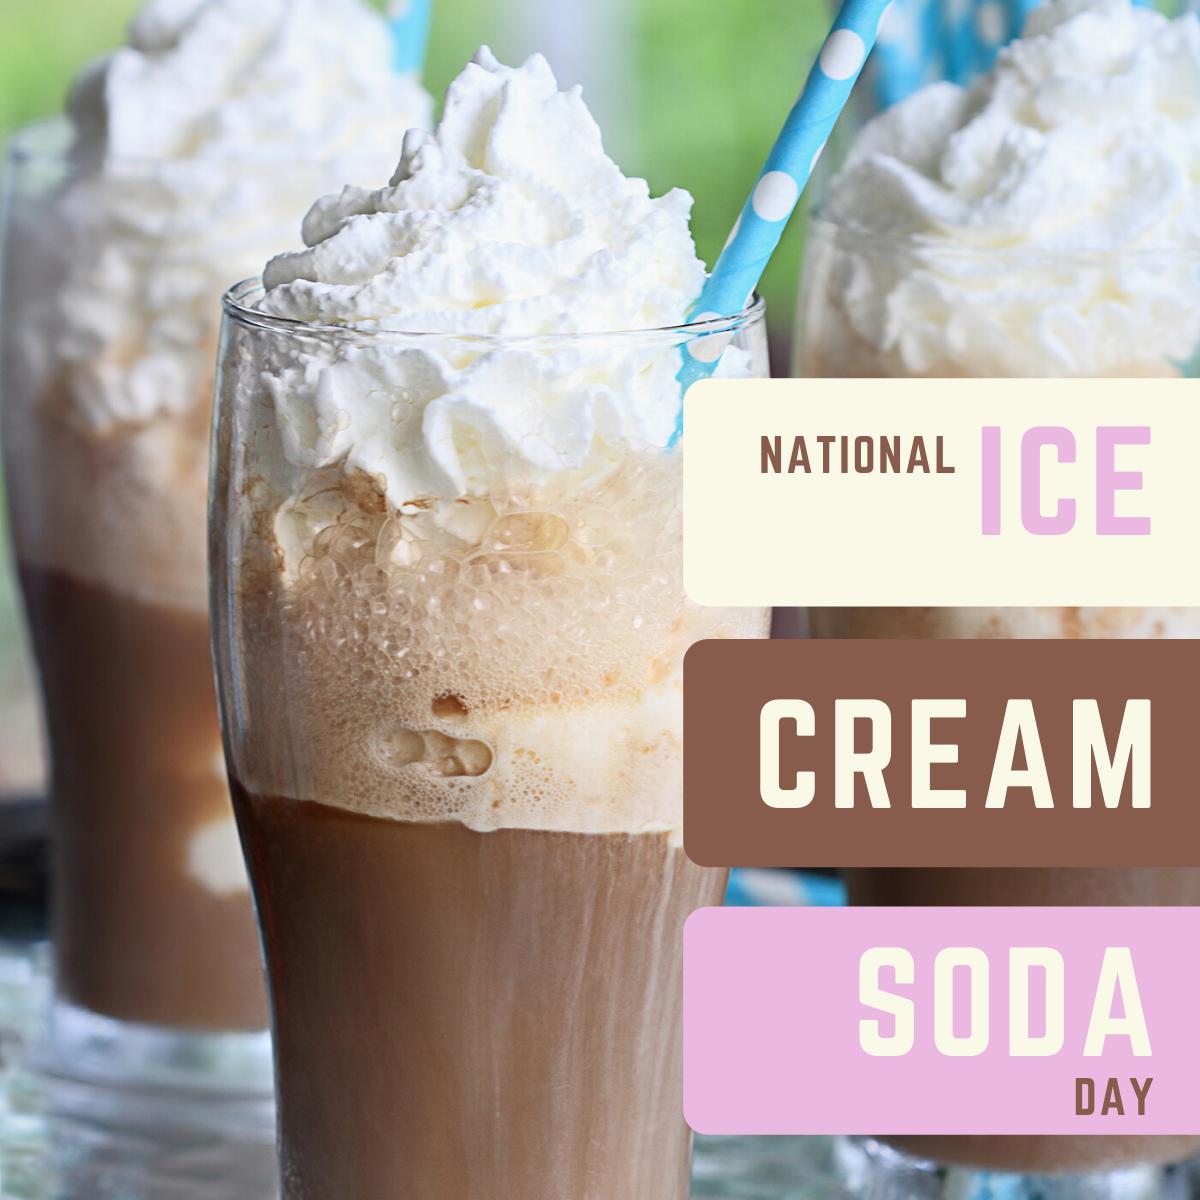 National-Ice-Cream-Soda-Day-option3